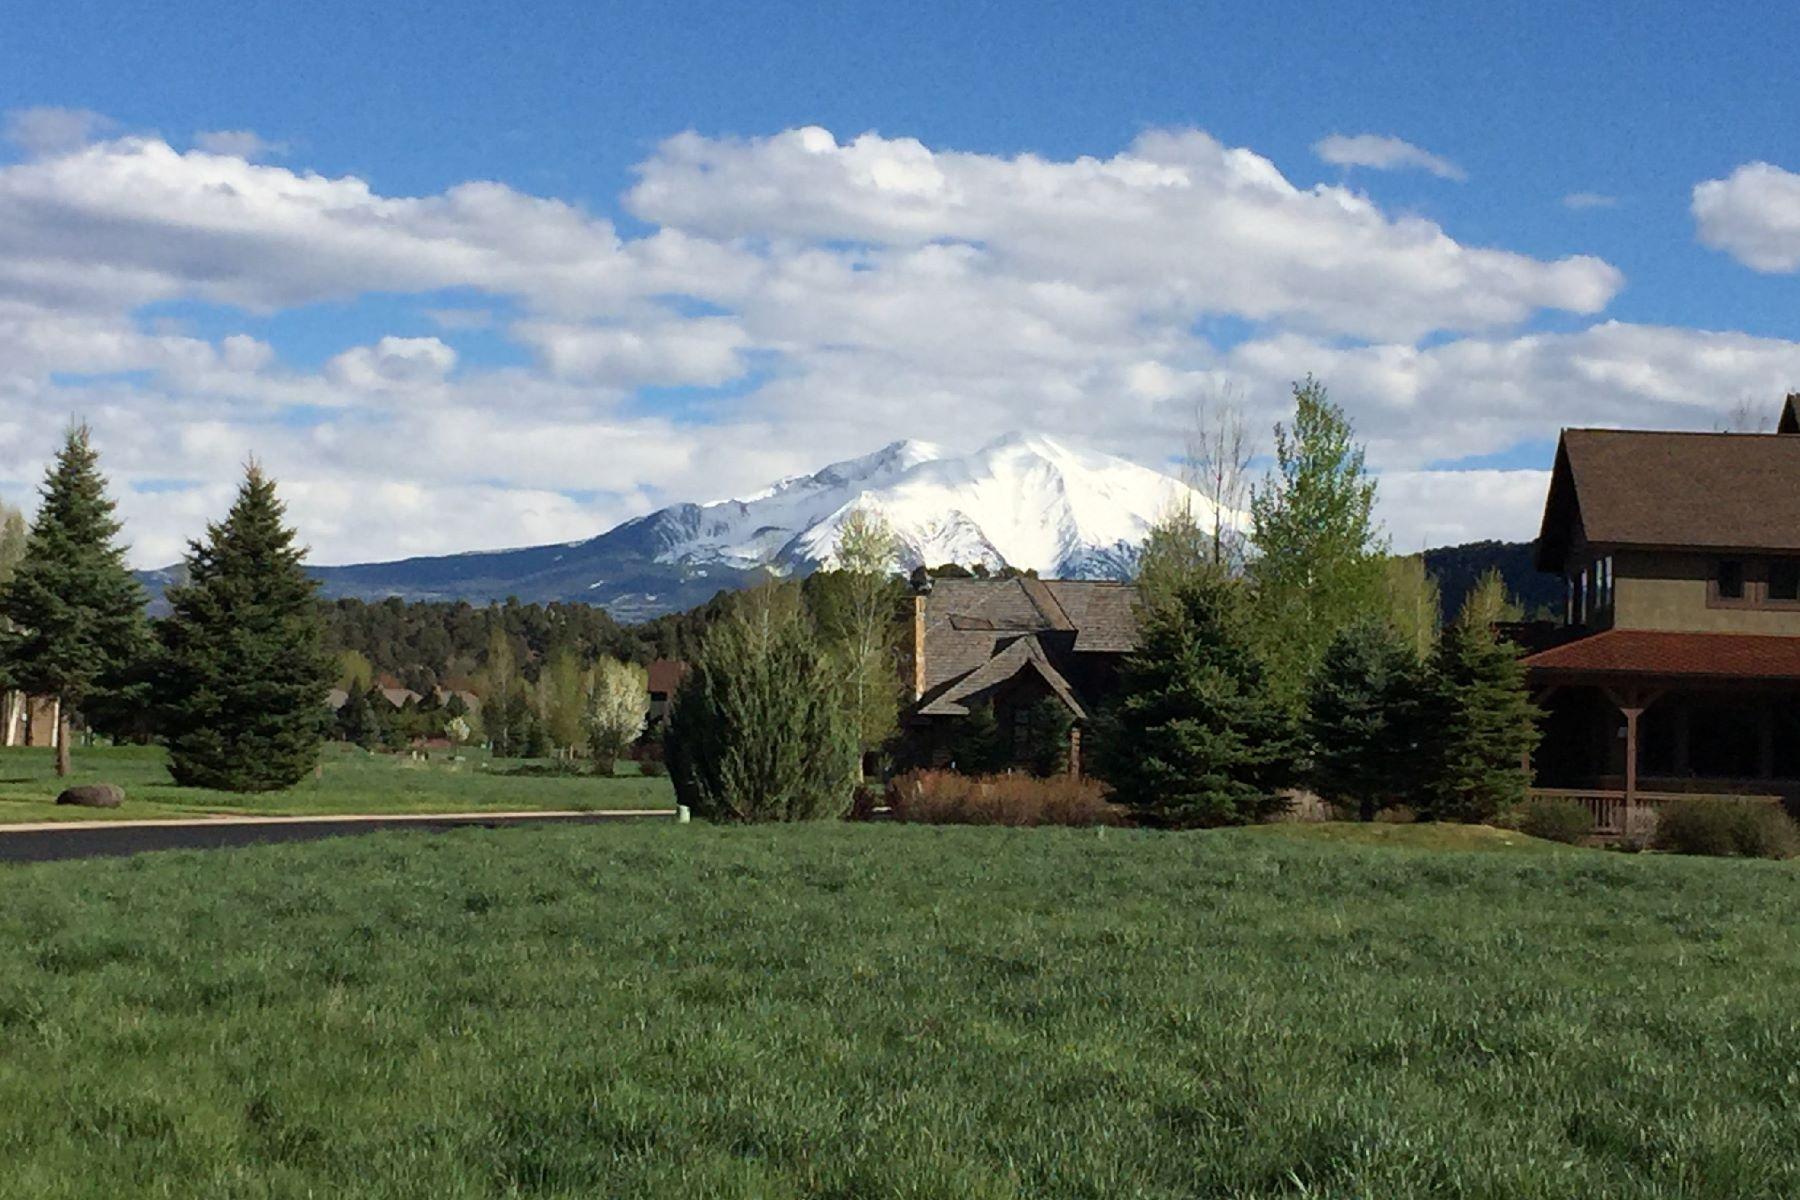 Land for Sale at Views of Mt. Sopris 131 Saddleback Road Carbondale, Colorado, 81623 United States